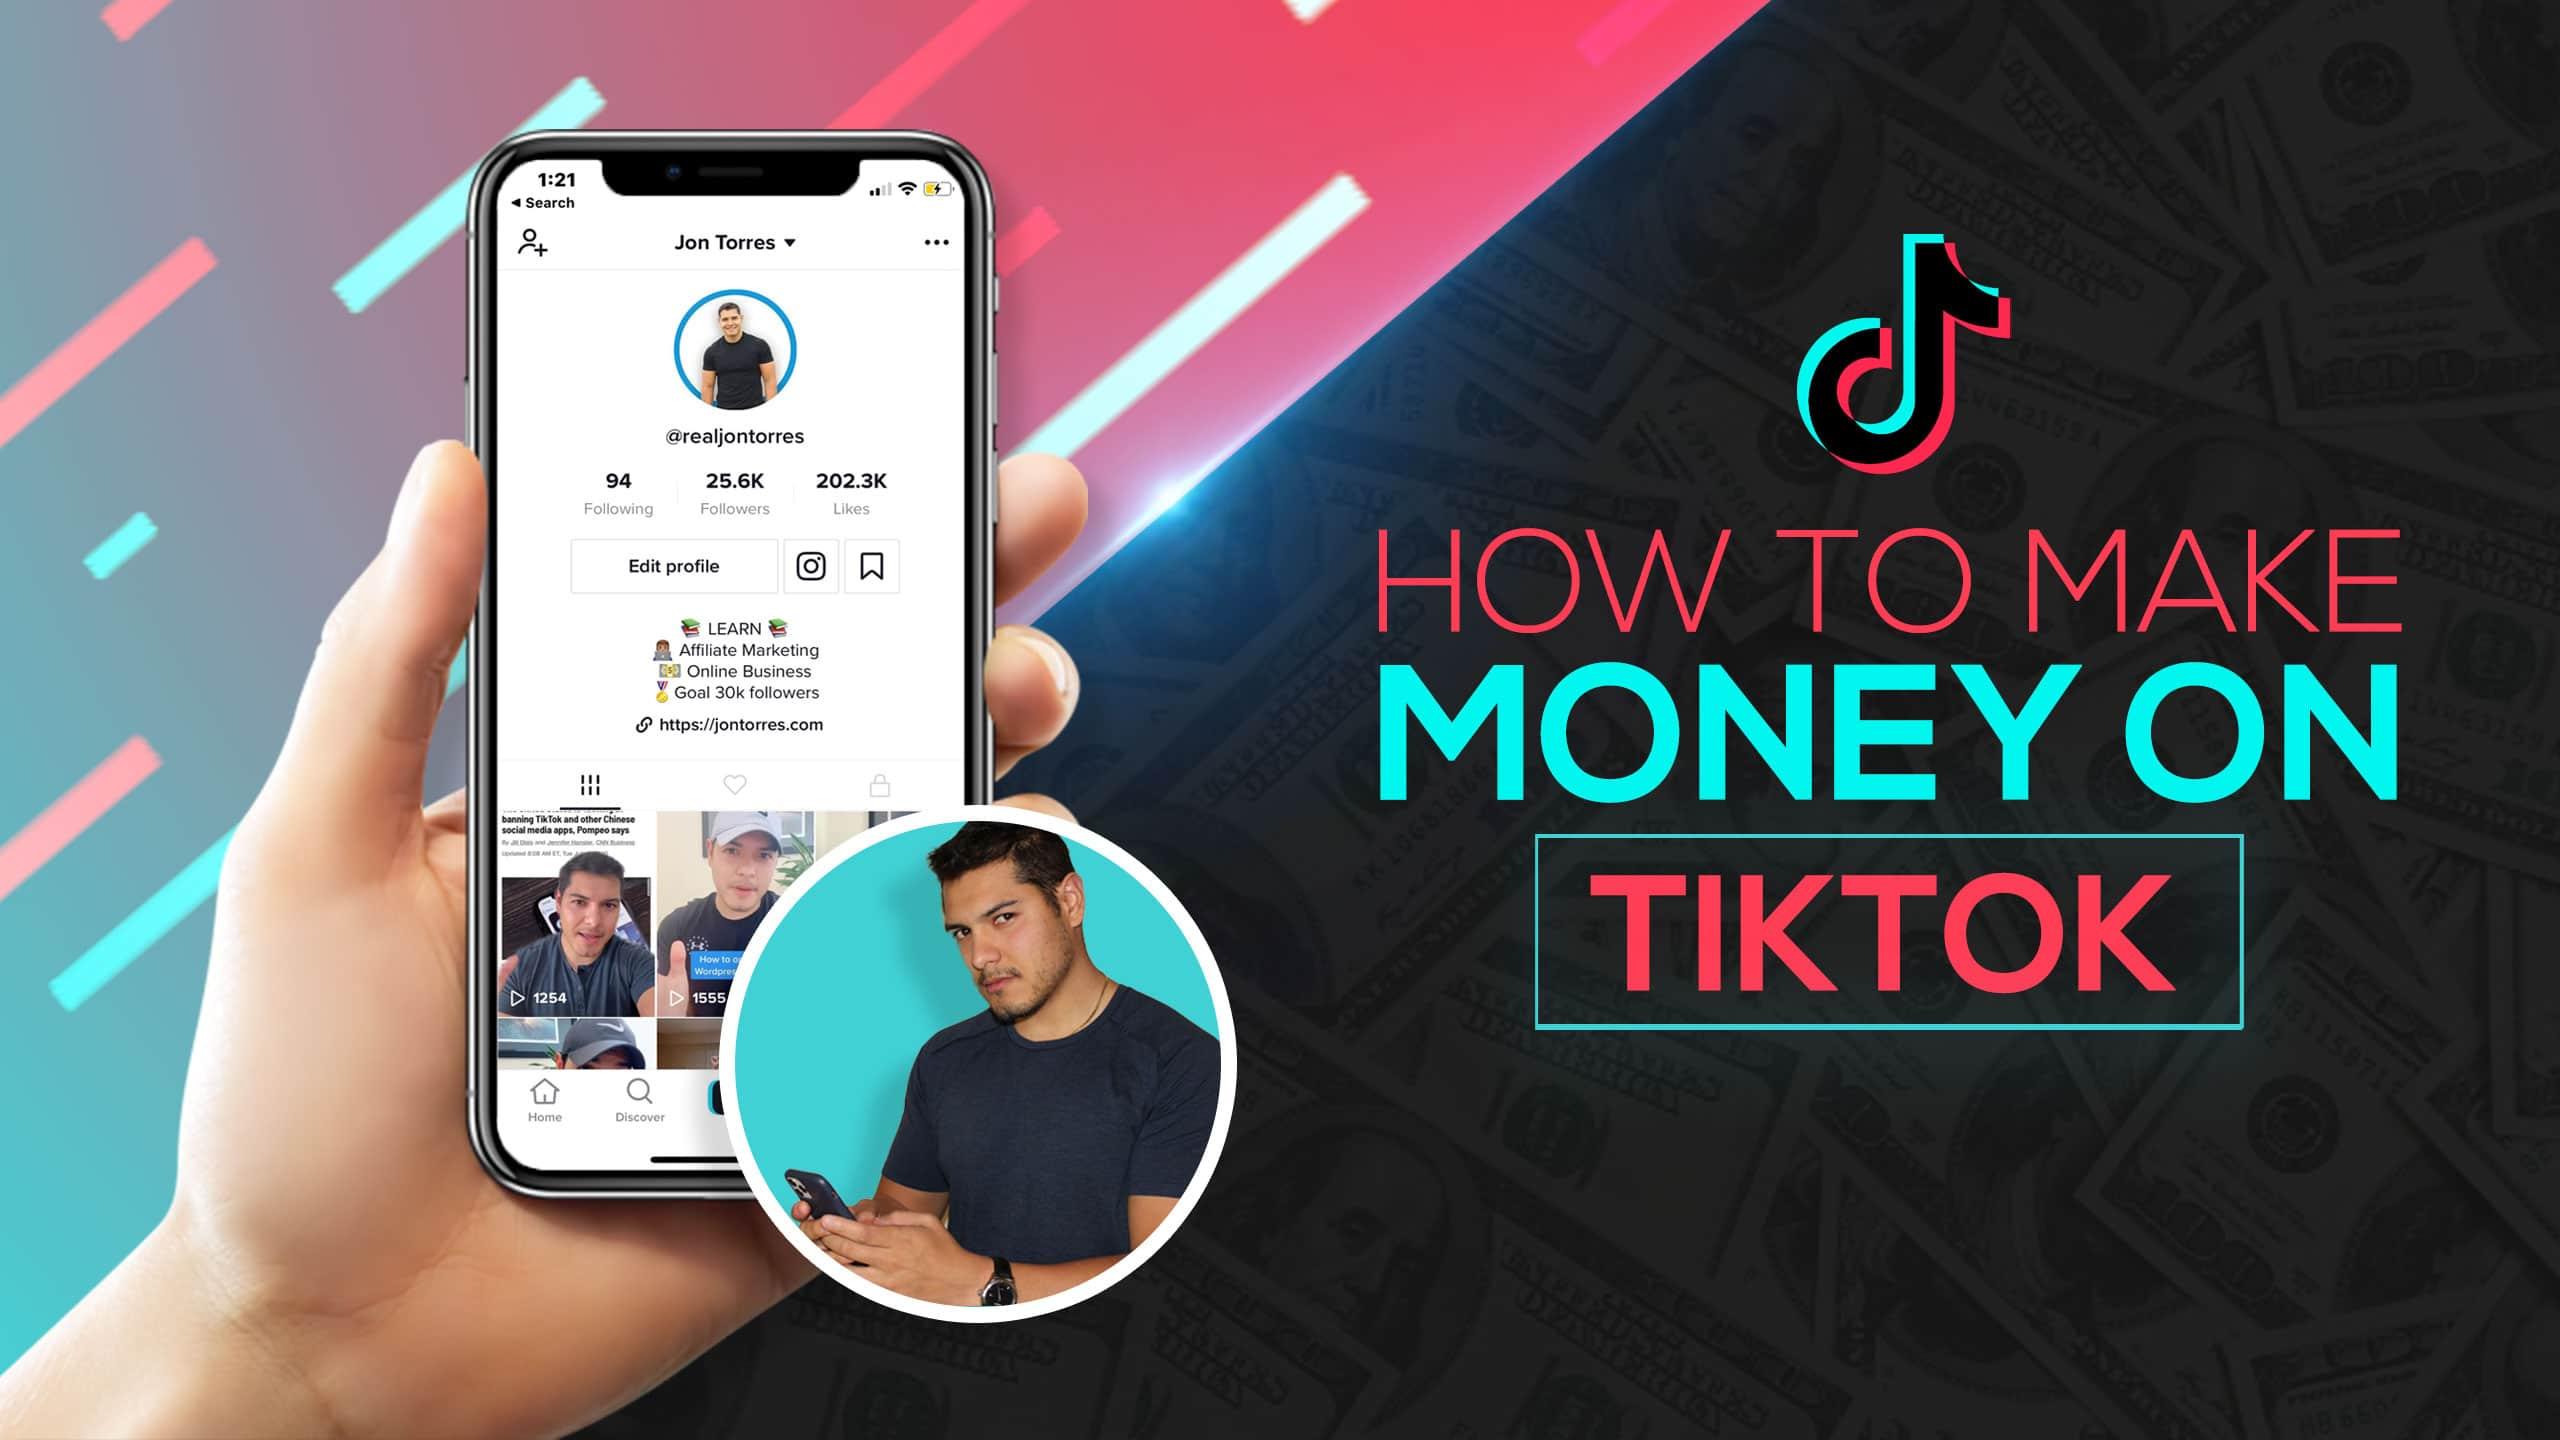 Make Money on TikTok